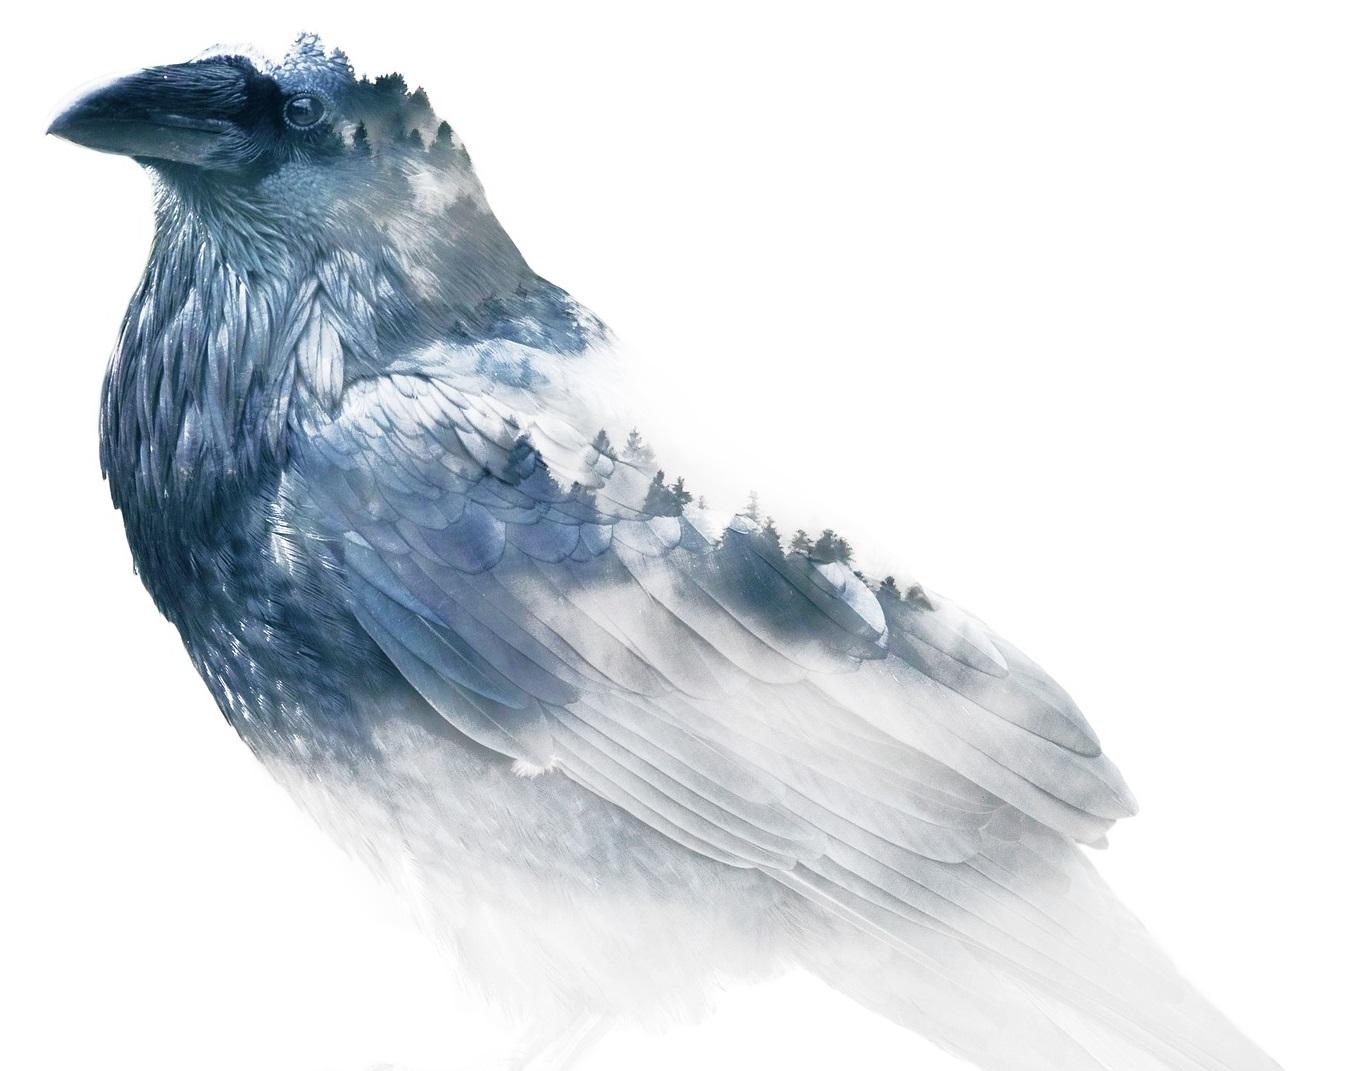 raven-3109587_1920.jpg